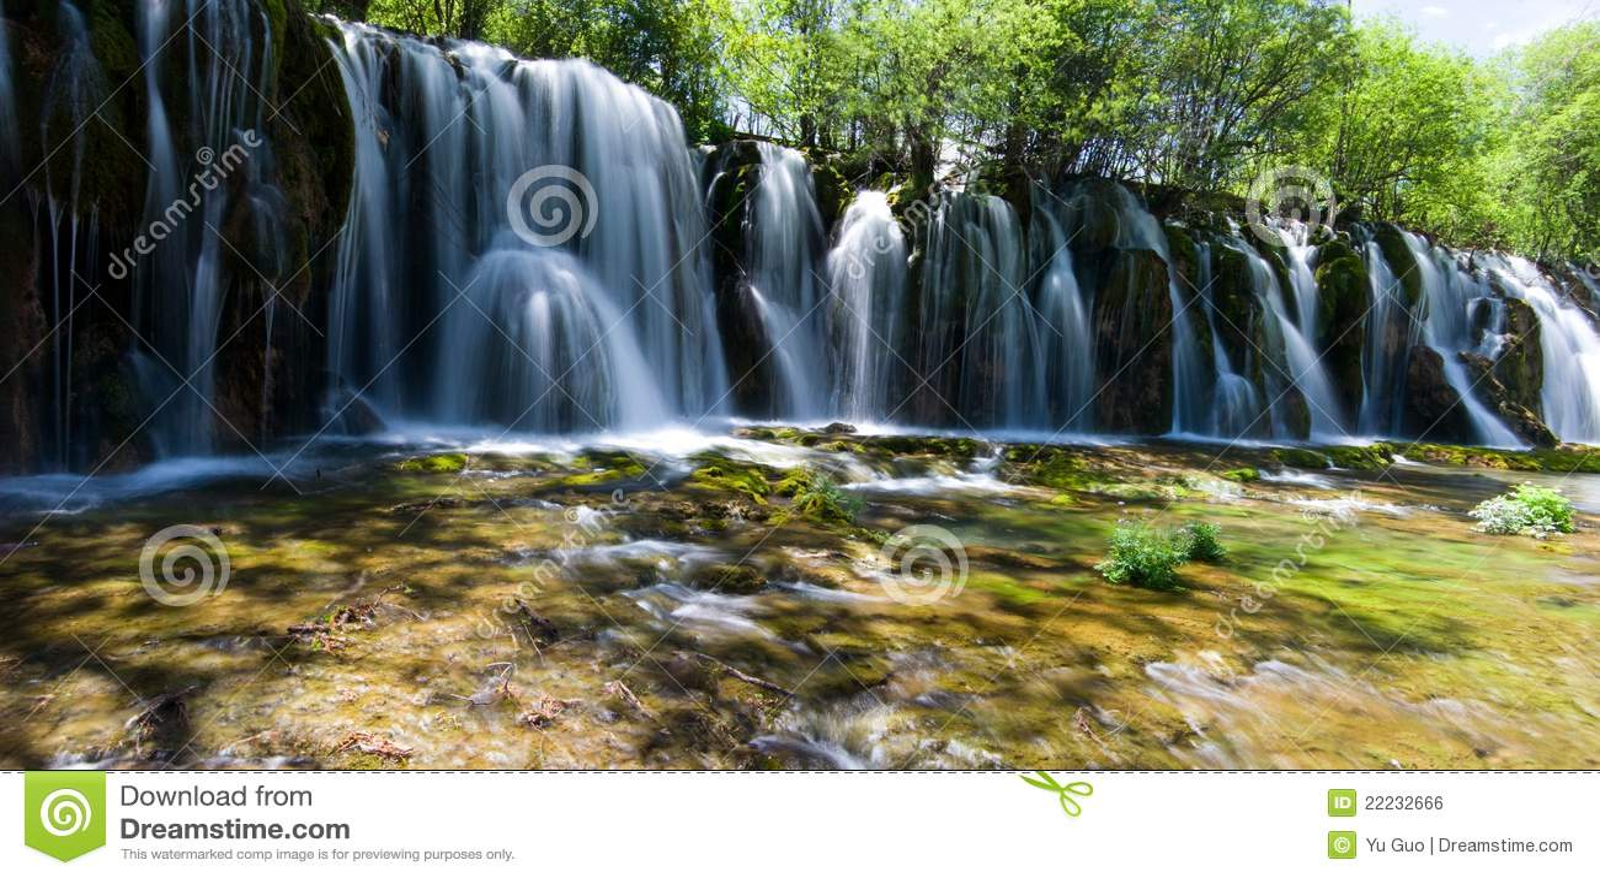 Jiuzhaigou Panda Pool waterfall